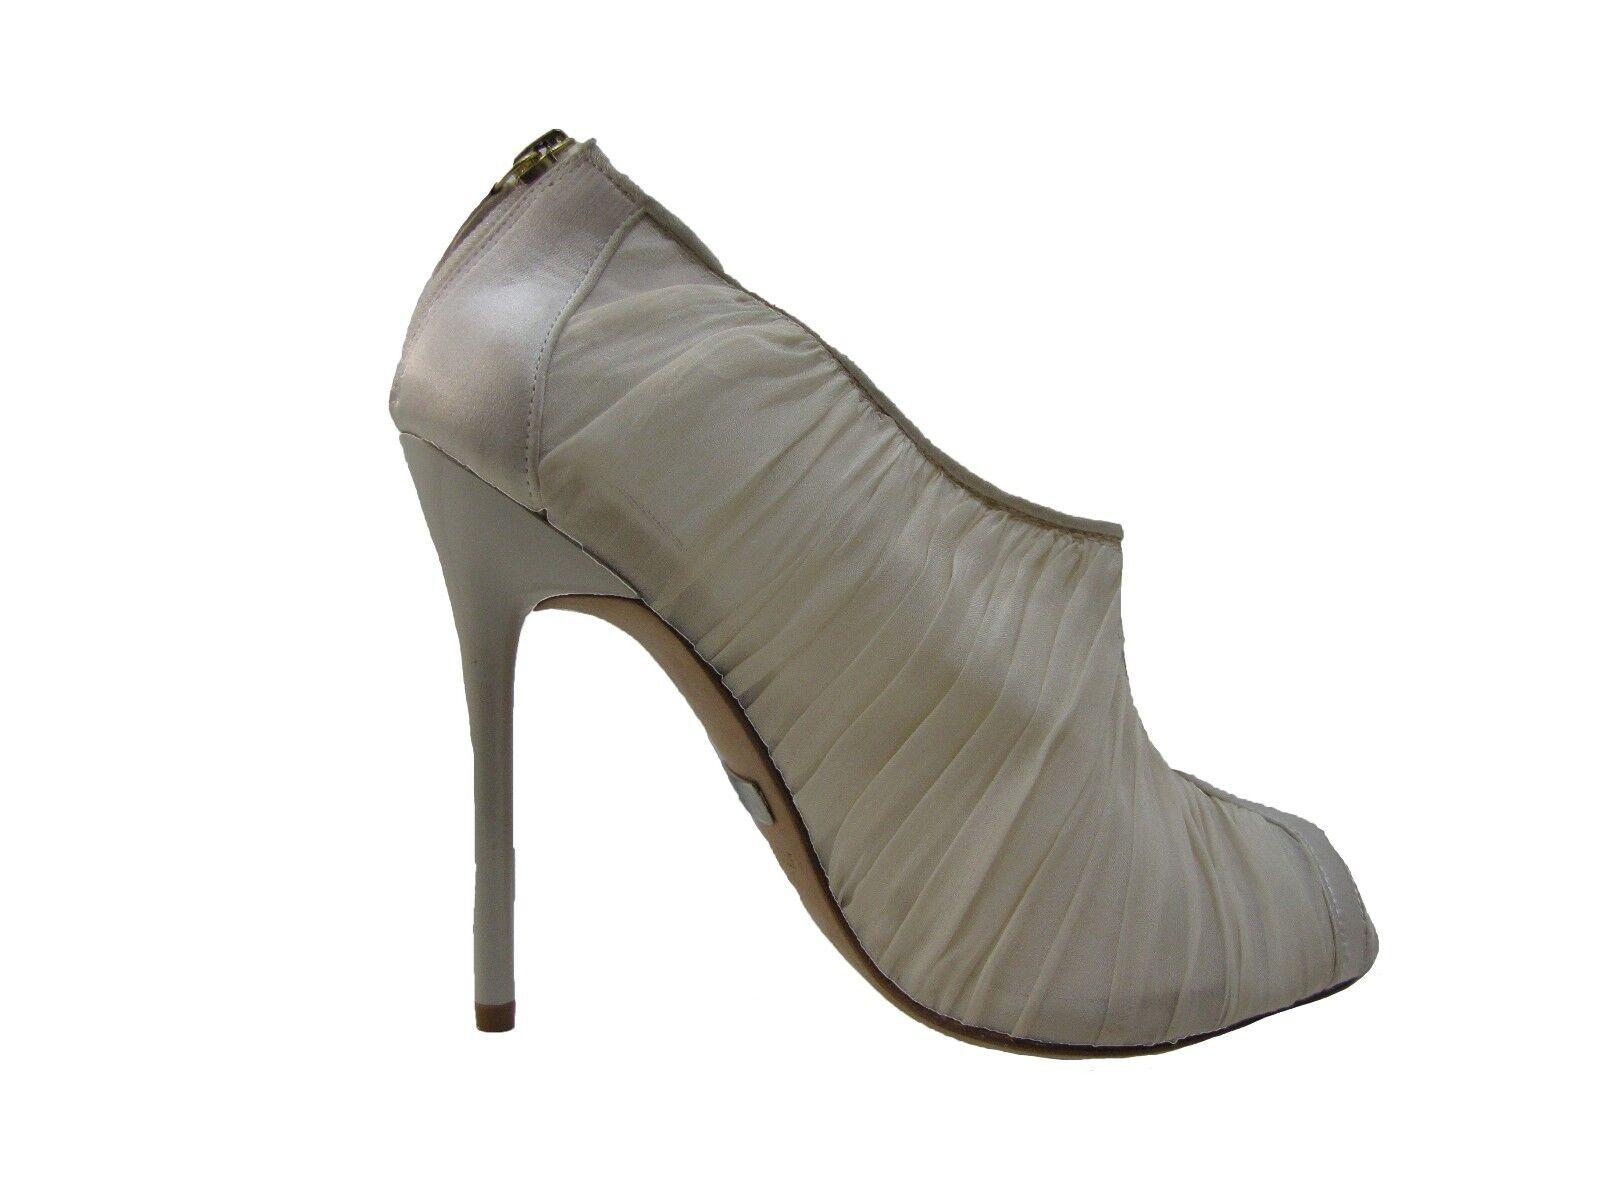 Badgley Mischka damen Dariene Dariene Dariene Peep Toe Back Zip Formal Fashion Dress Heels 83ba2e